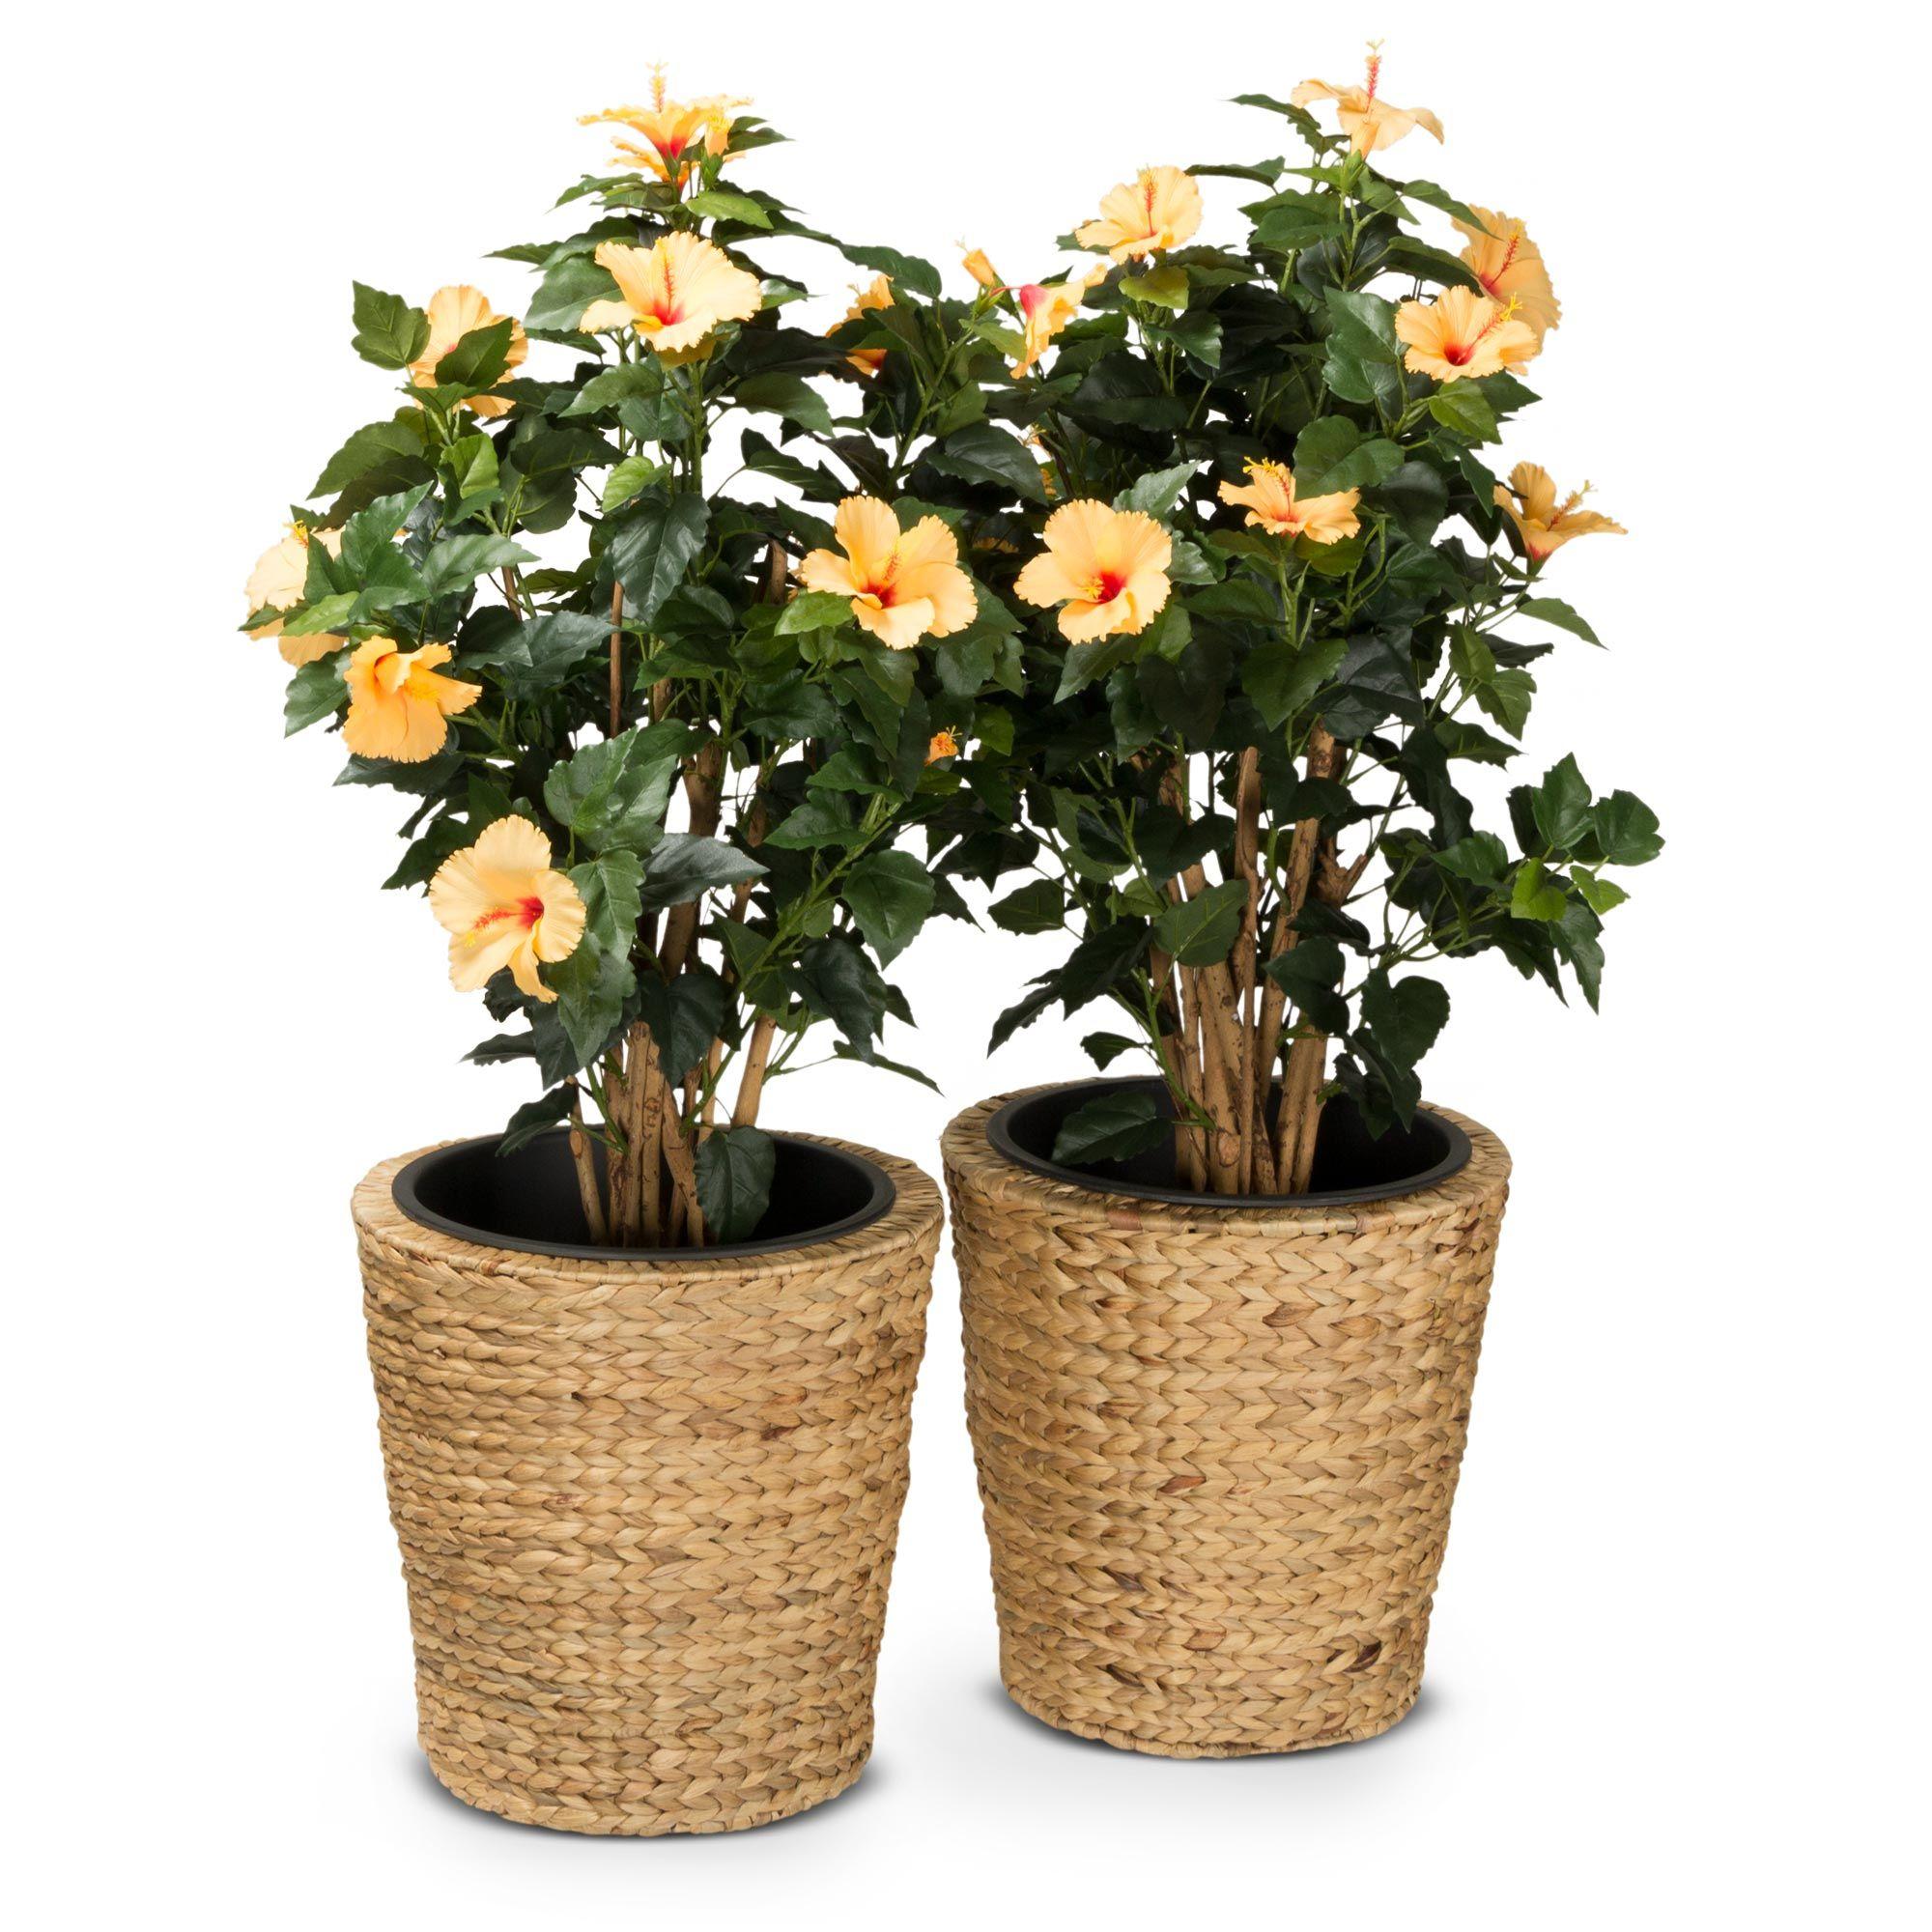 2er Set Pflanzkubel Tubo 40 Wasserhyazinthe Pflanzen